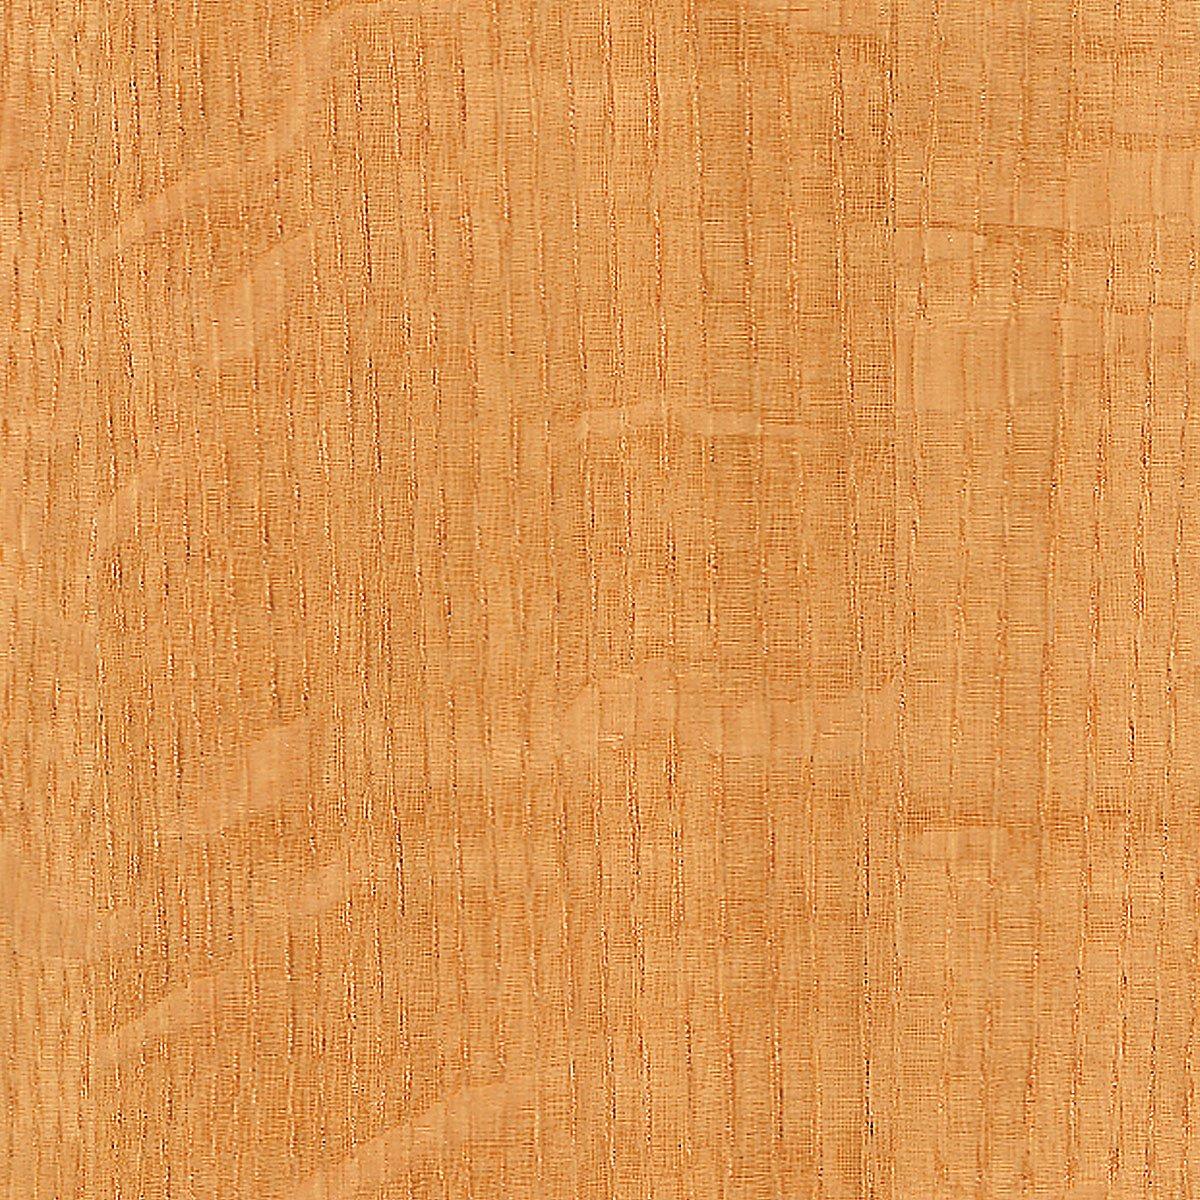 White Oak Wood Veneer Qtr Hvy Flake 4x8 2 Ply(Woodback) Sheet